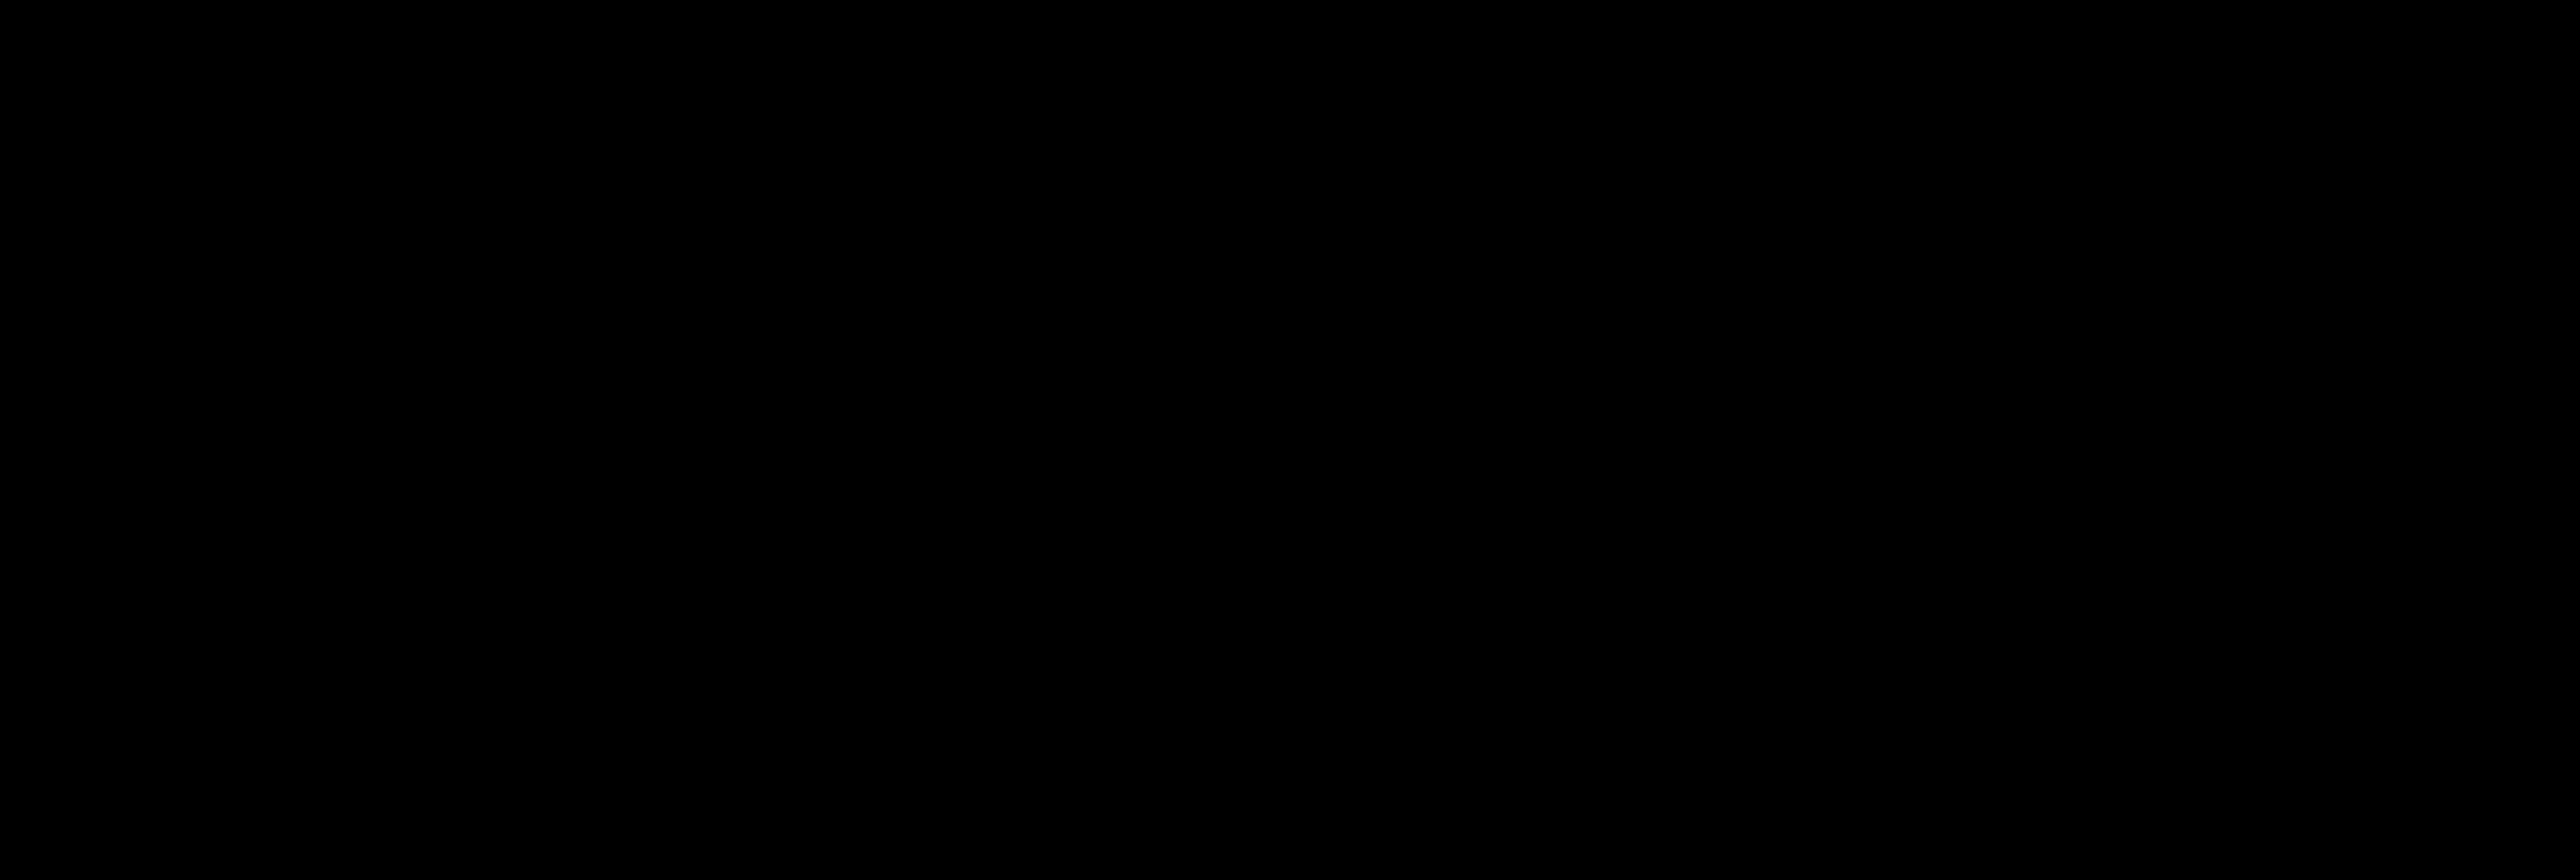 adelaar png